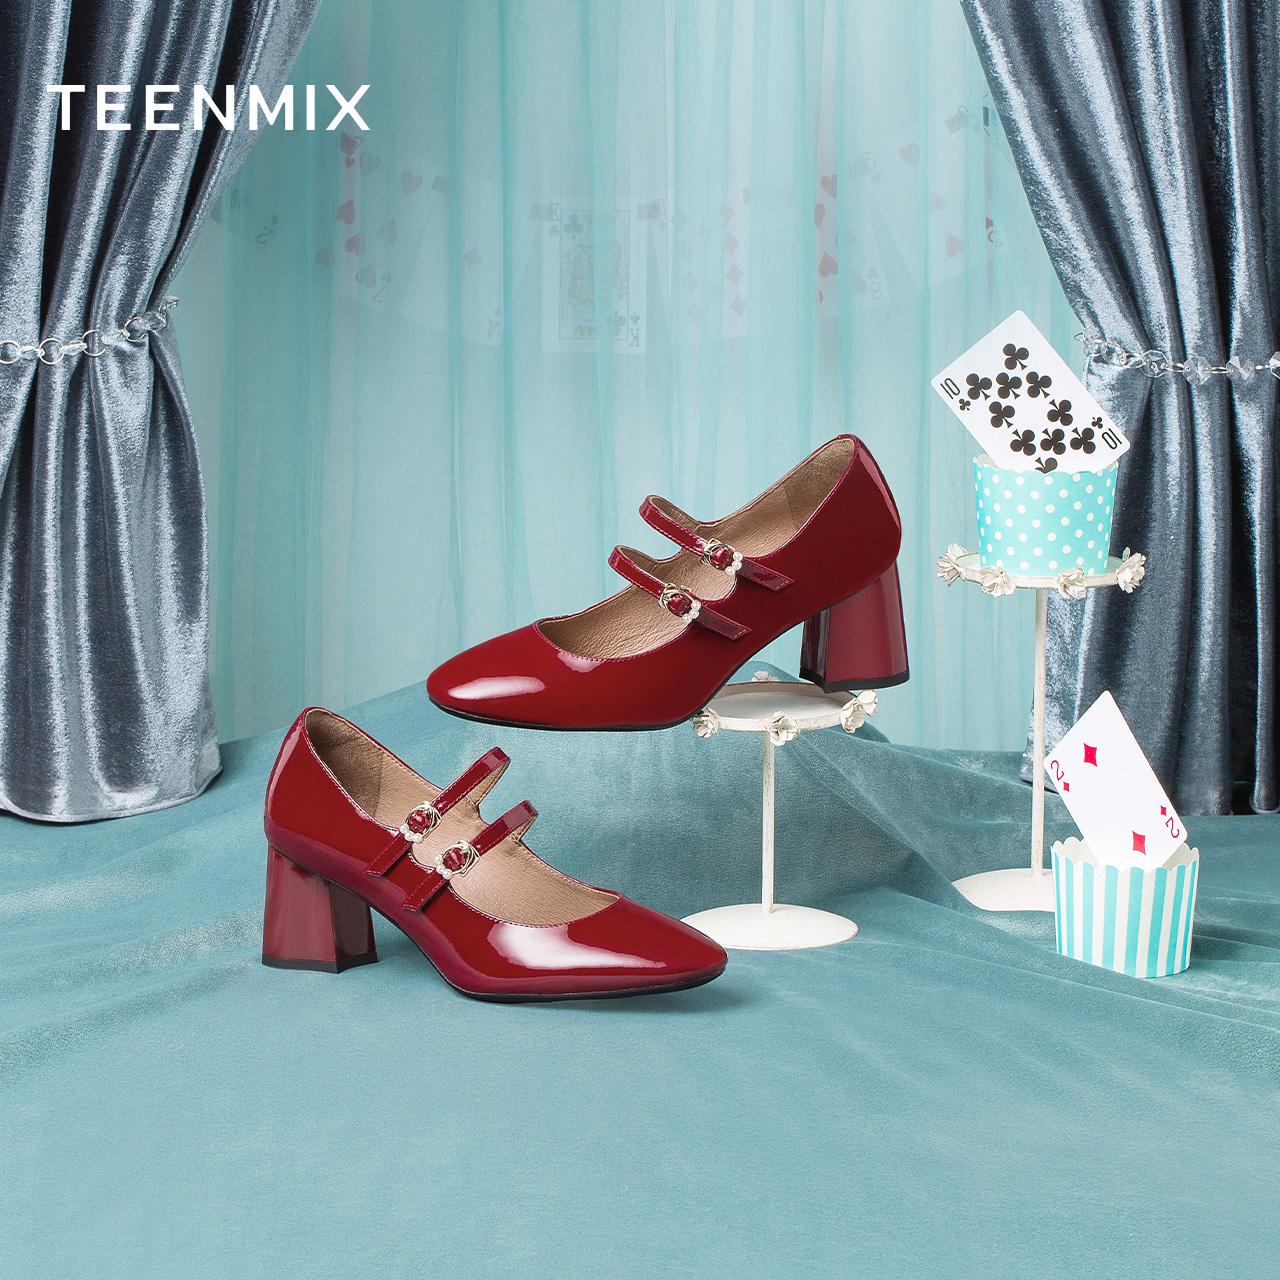 CHT09CQ0 秋新款红色复古玛丽珍女鞋单鞋 2020 天美意高跟鞋女